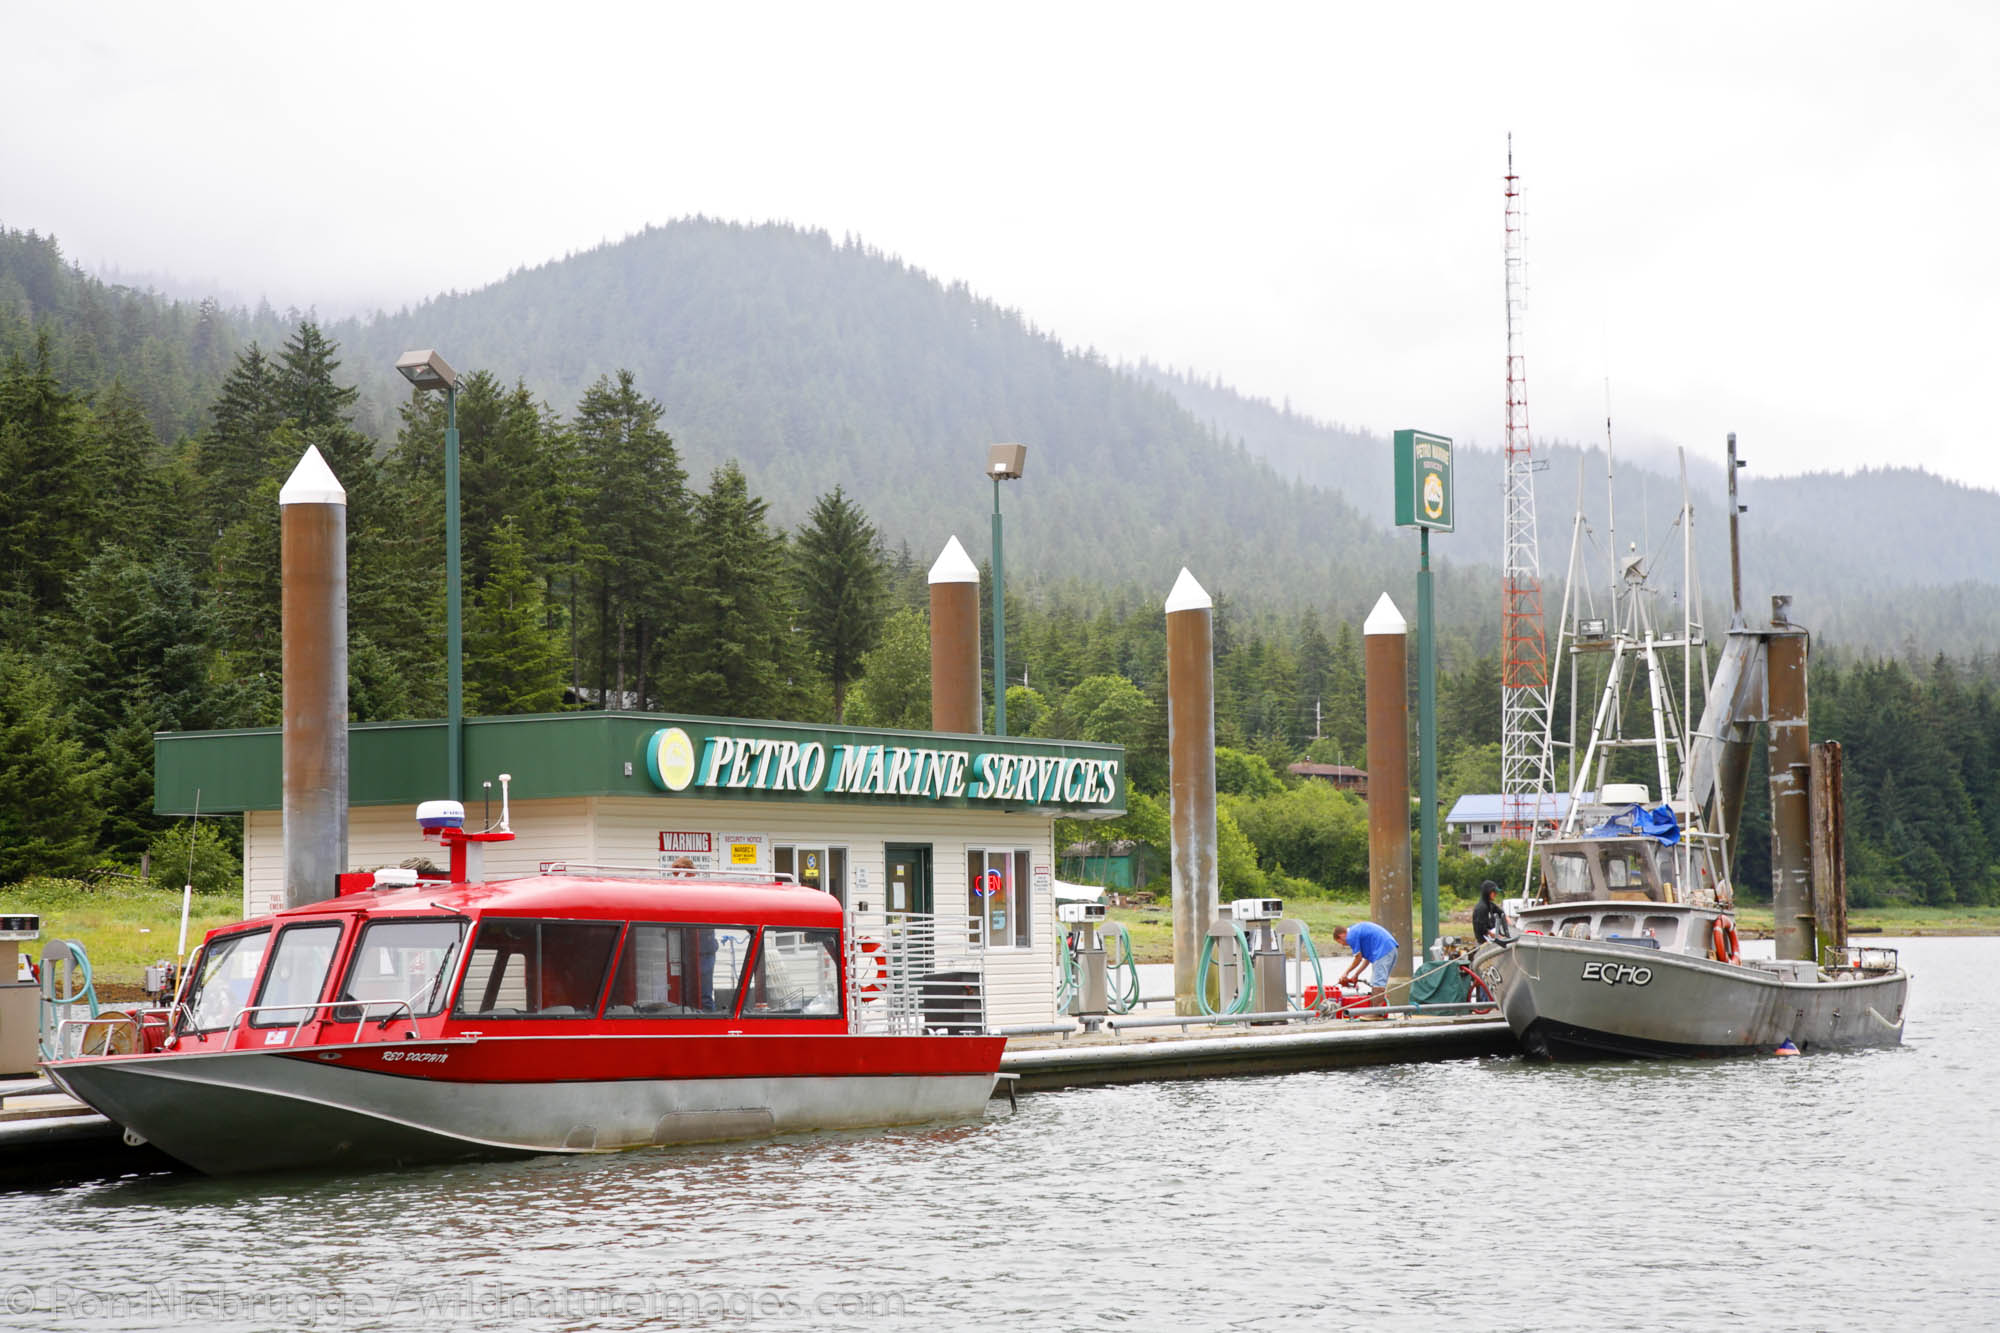 The Petro Marine Services fuel dock, Juneau, Alaska.